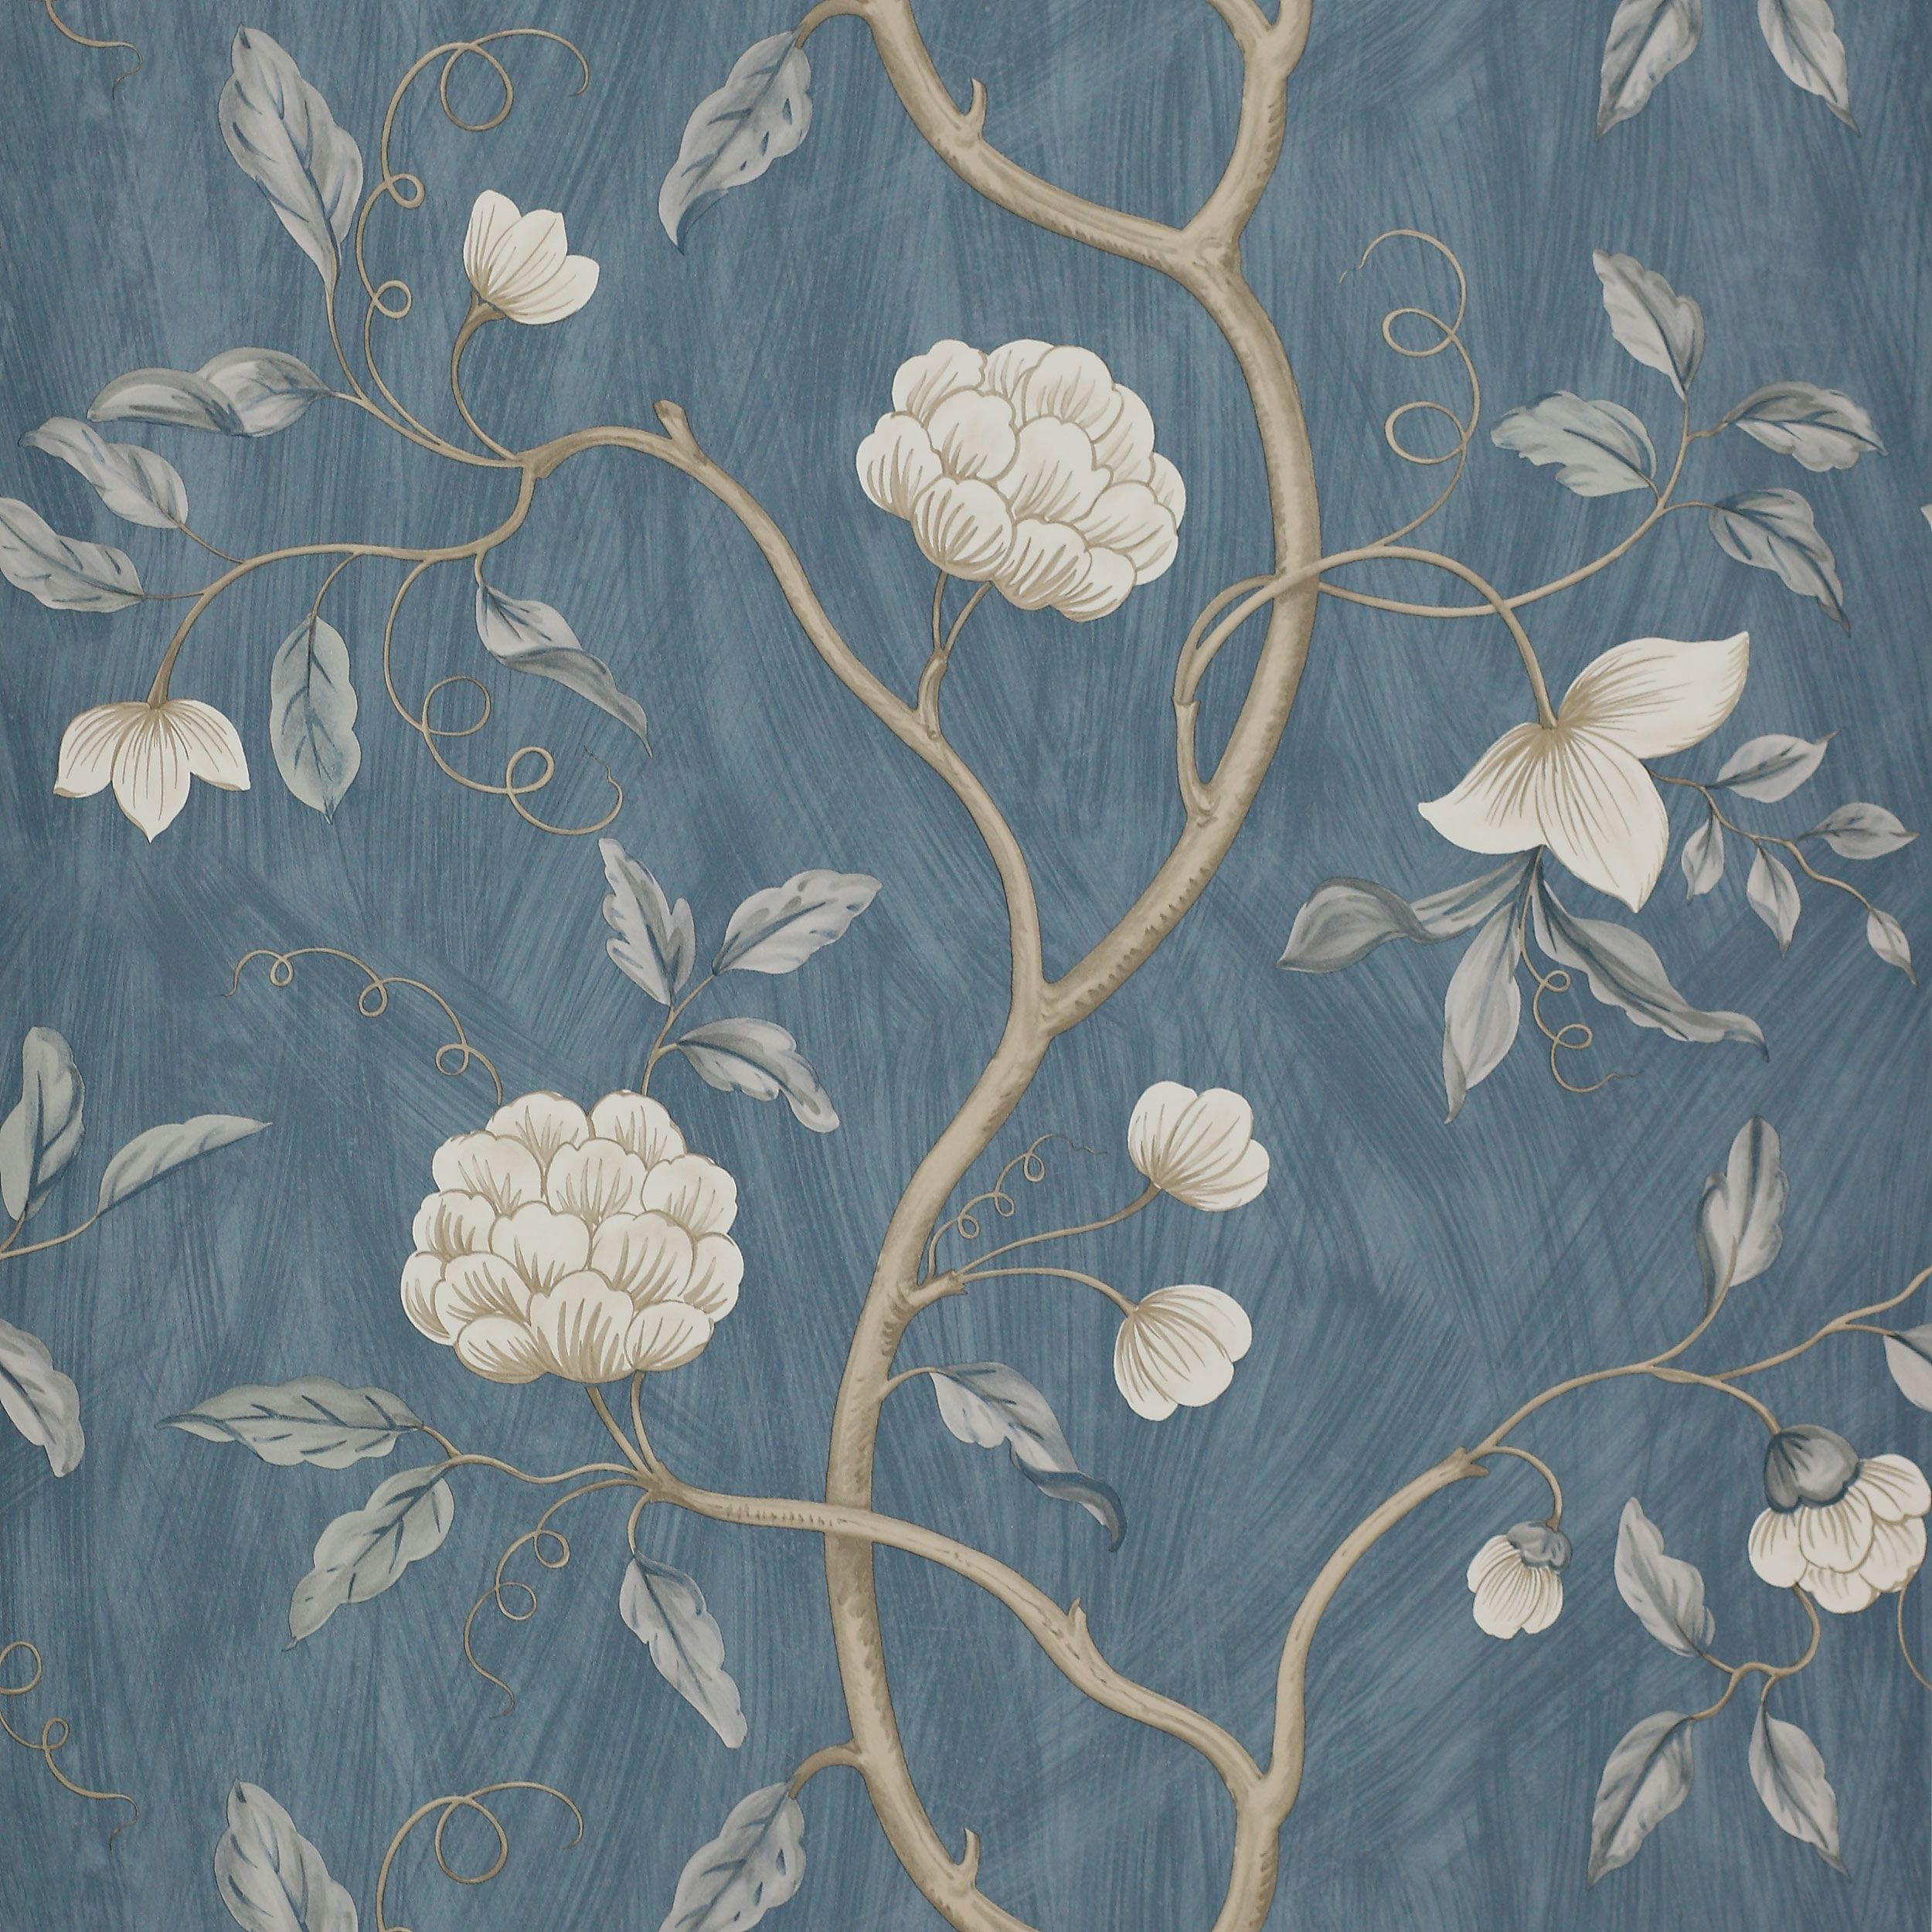 Papers That Never Date Tree Wallpaper Hallway Wallpaper